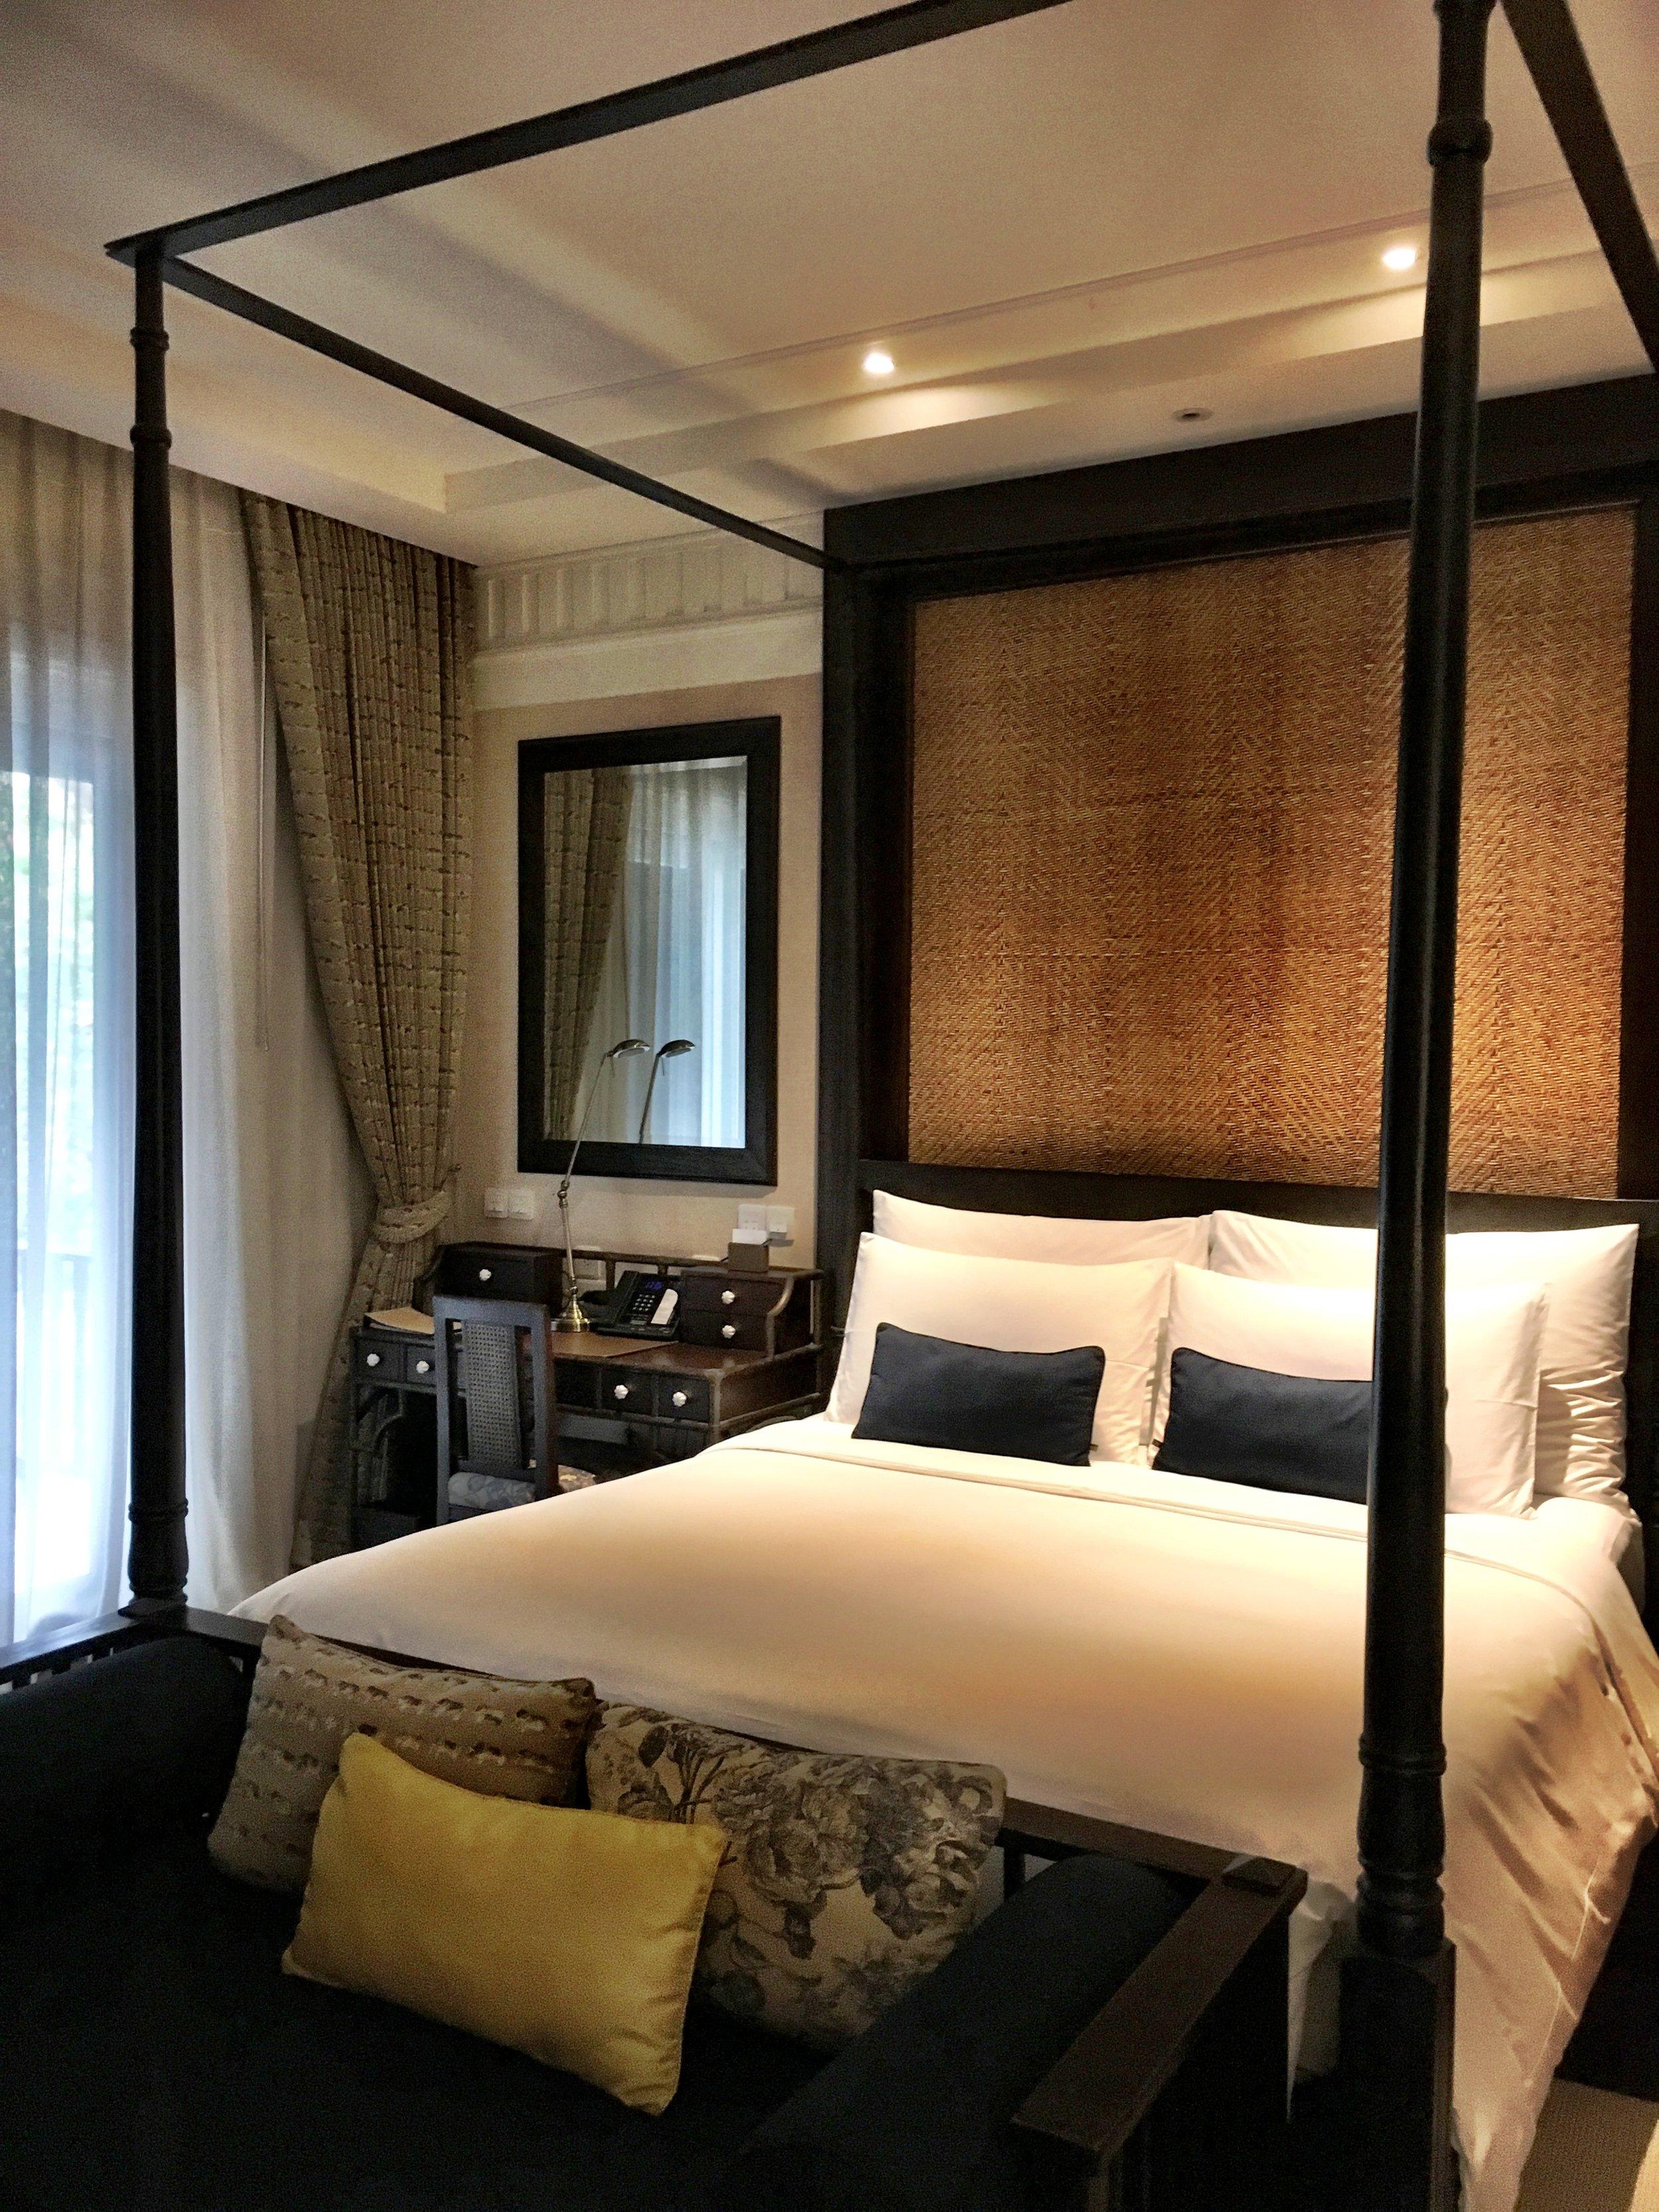 The Rajah Brooke Suite's bedroom